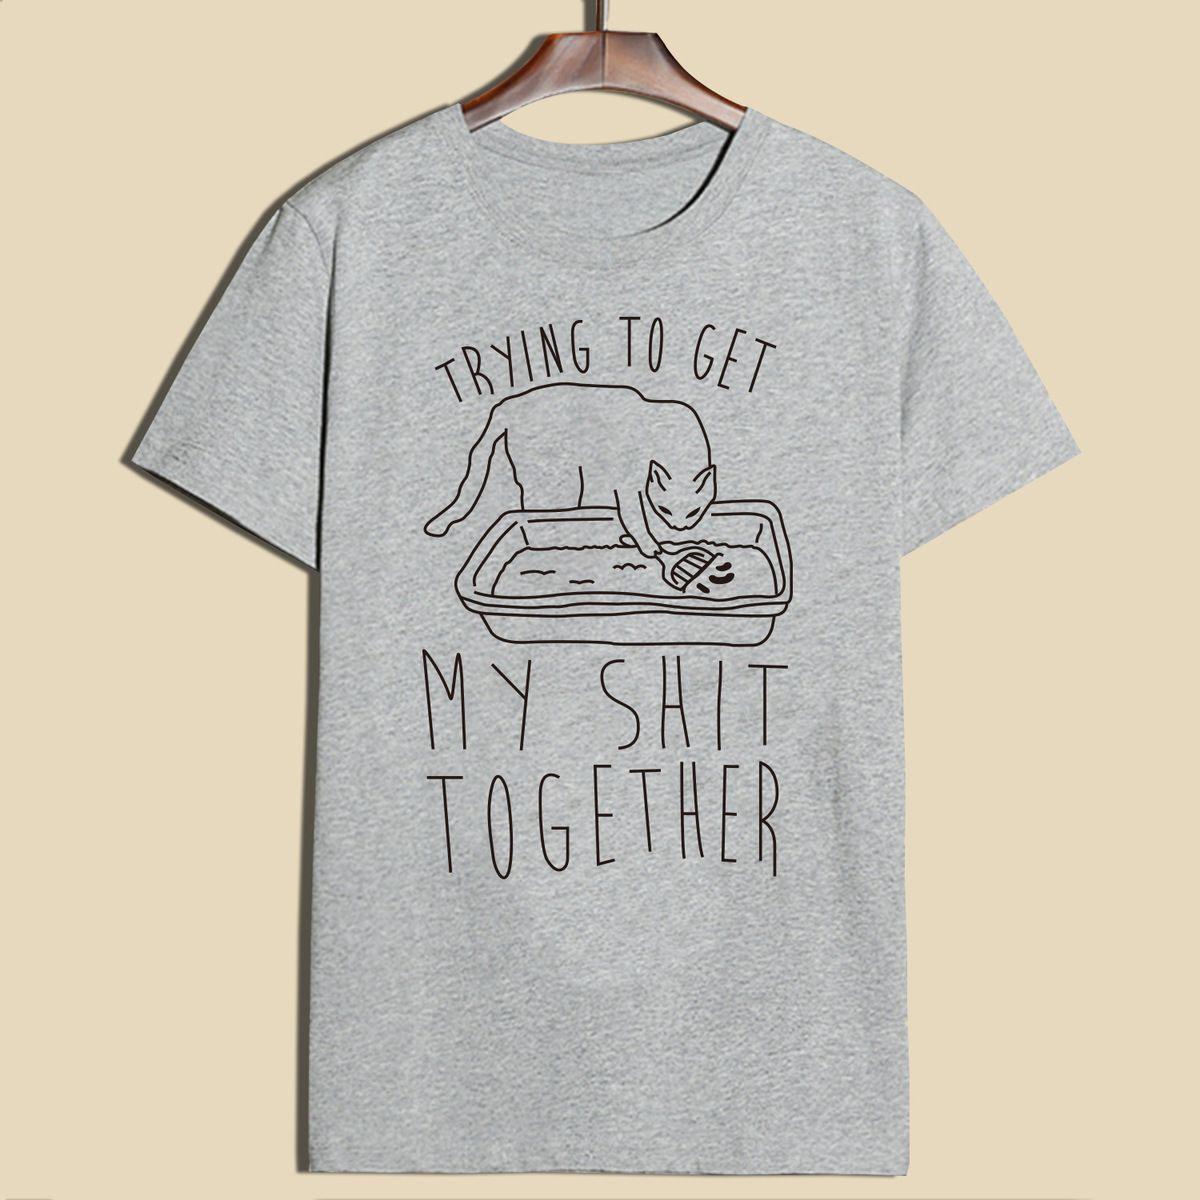 3cba2b318f Hillbilly Funny Cat Tshirt Women Clothing Printed Loose Oversize Summer Top  Harajuku Short Casual T Shirt Women Brand New Tumblr Y18122401 Shopping T  Shirts ...